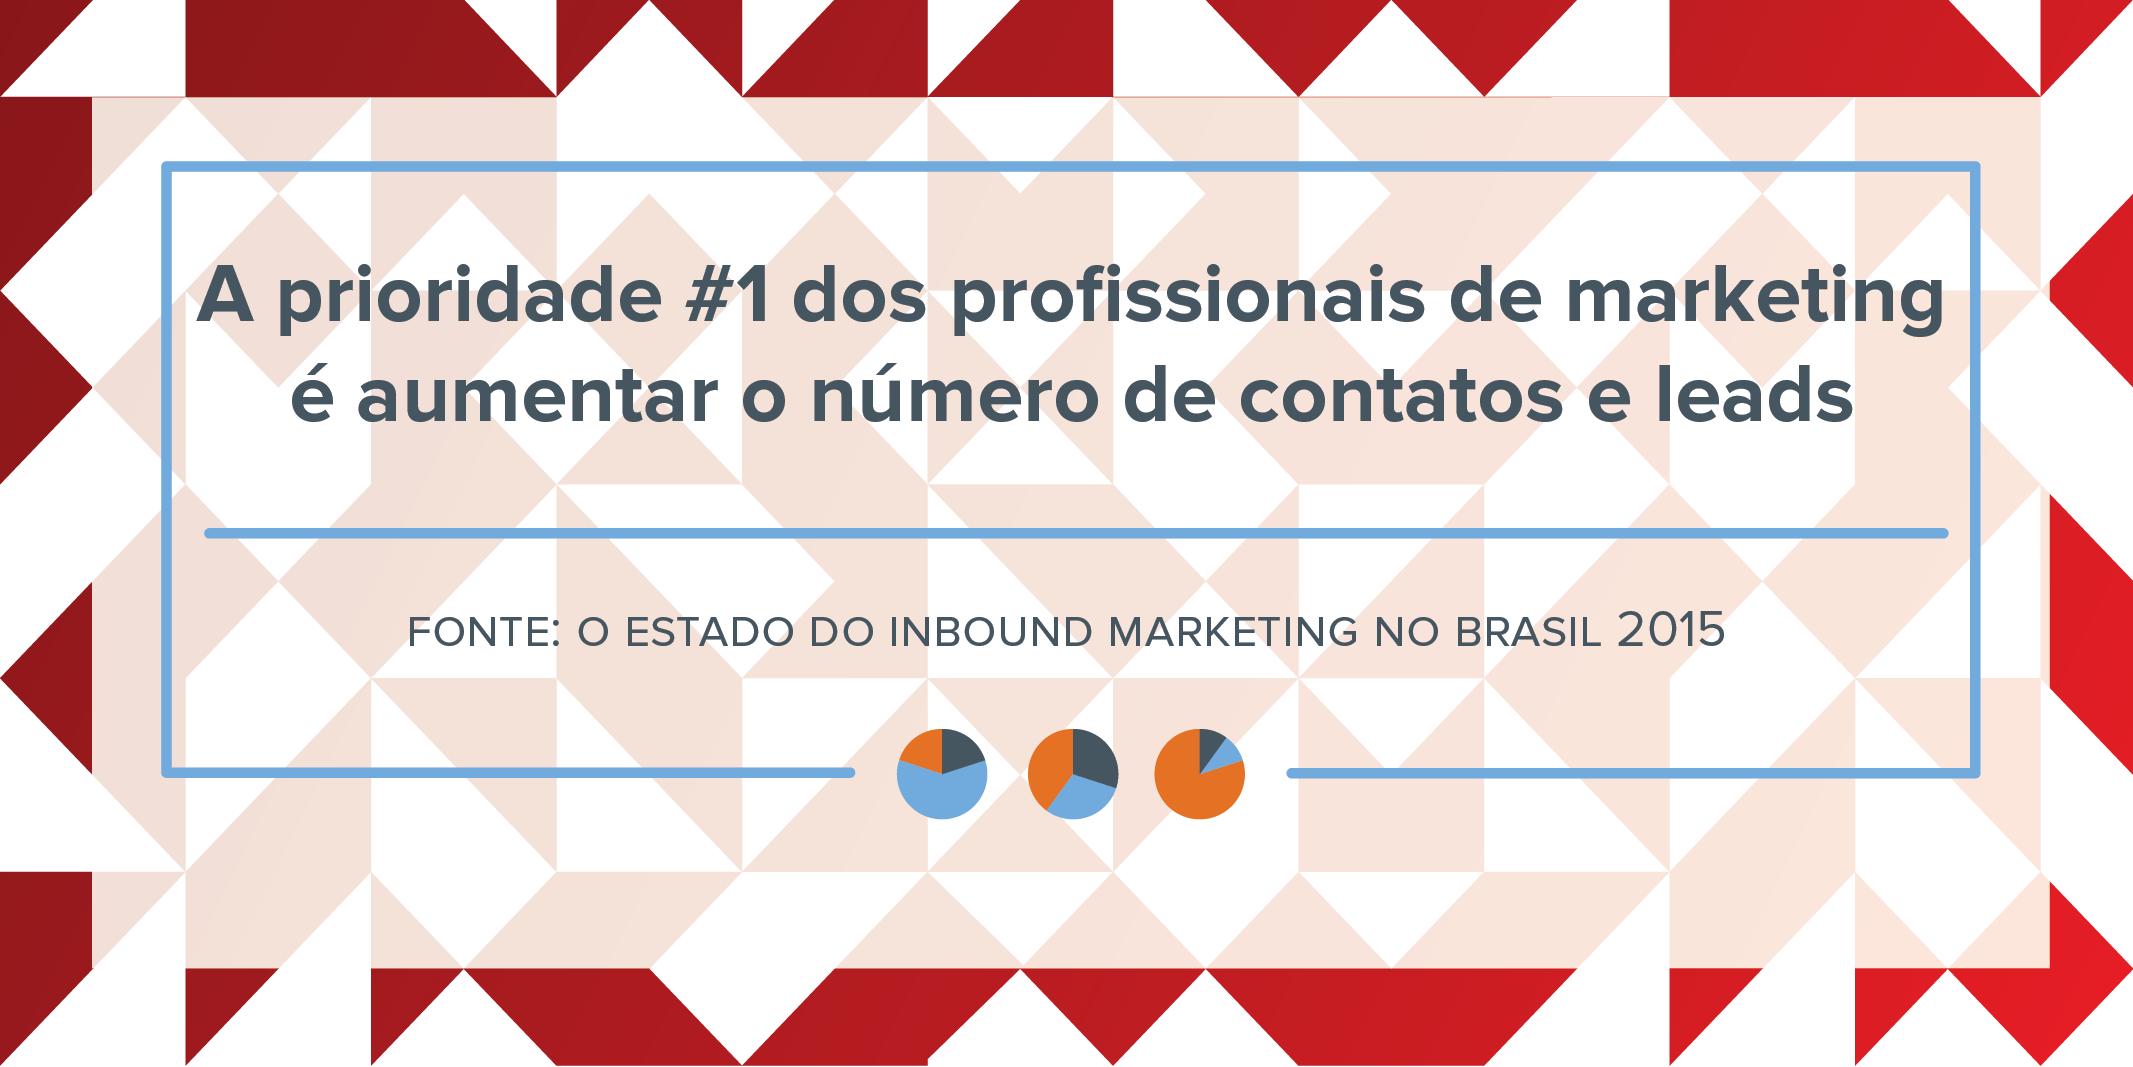 estatisticas-sobre-inbound-marketing.png